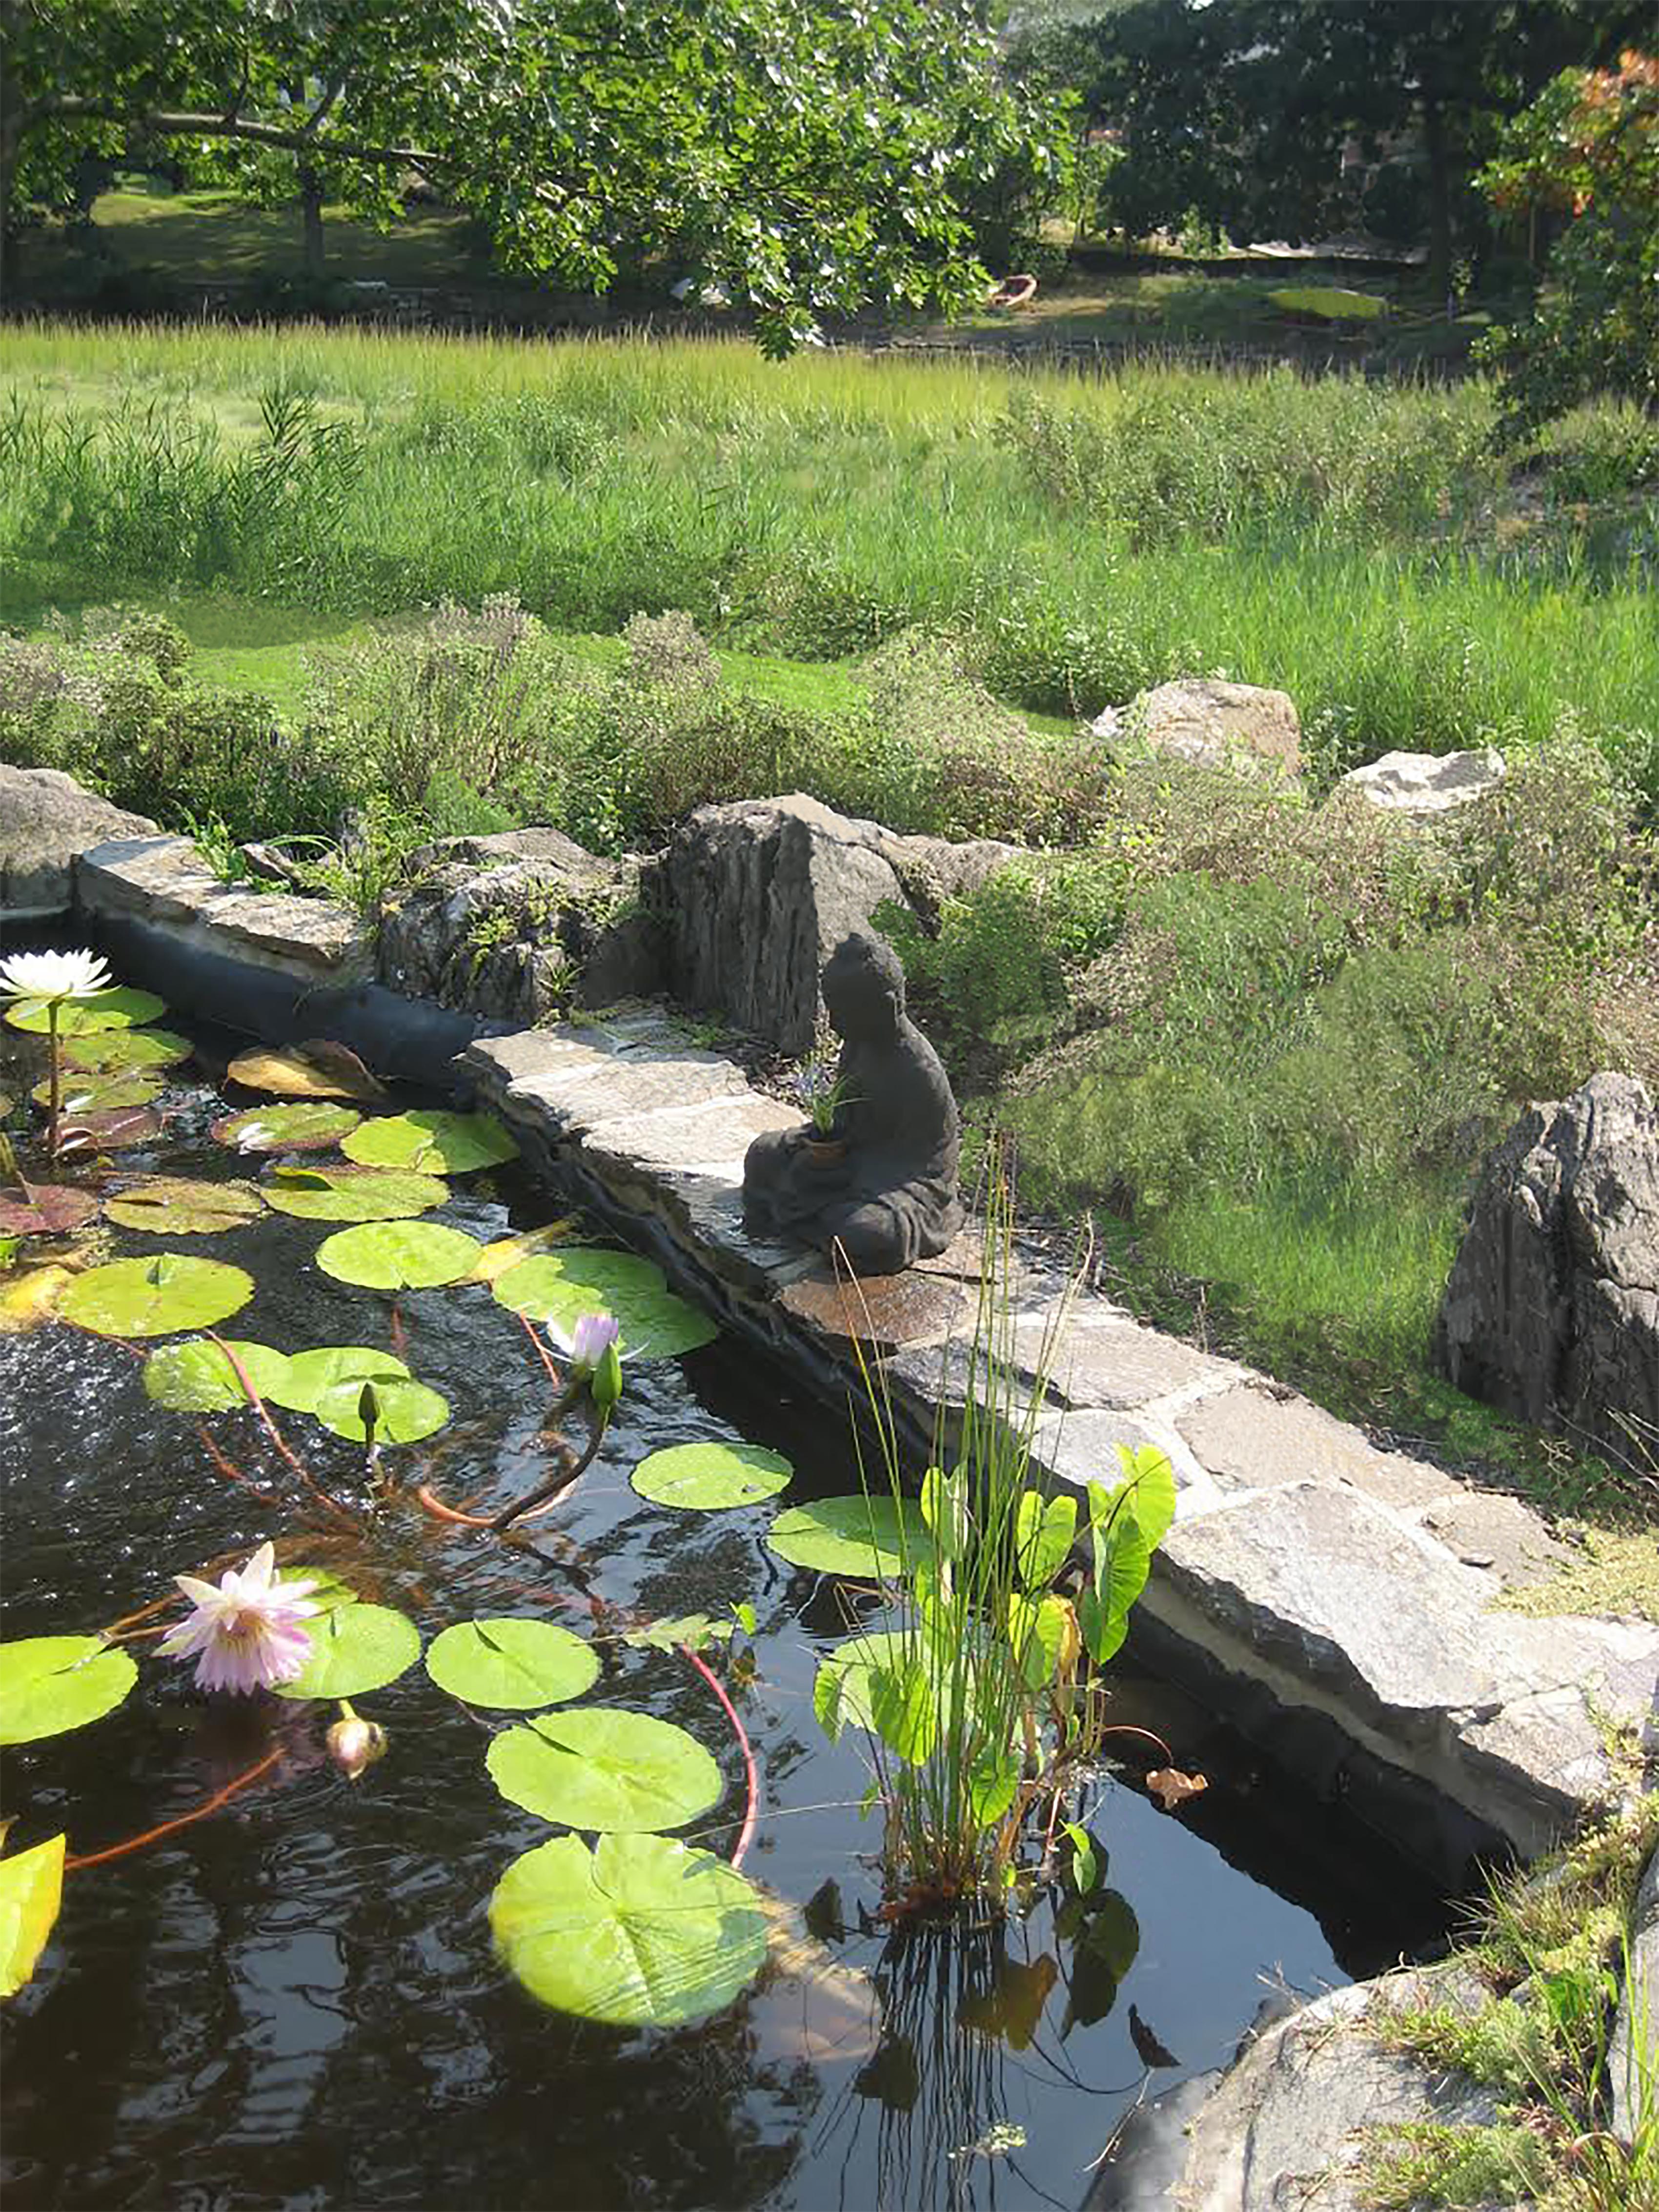 Meadow Garden, Larchmont, NY   CDL/S